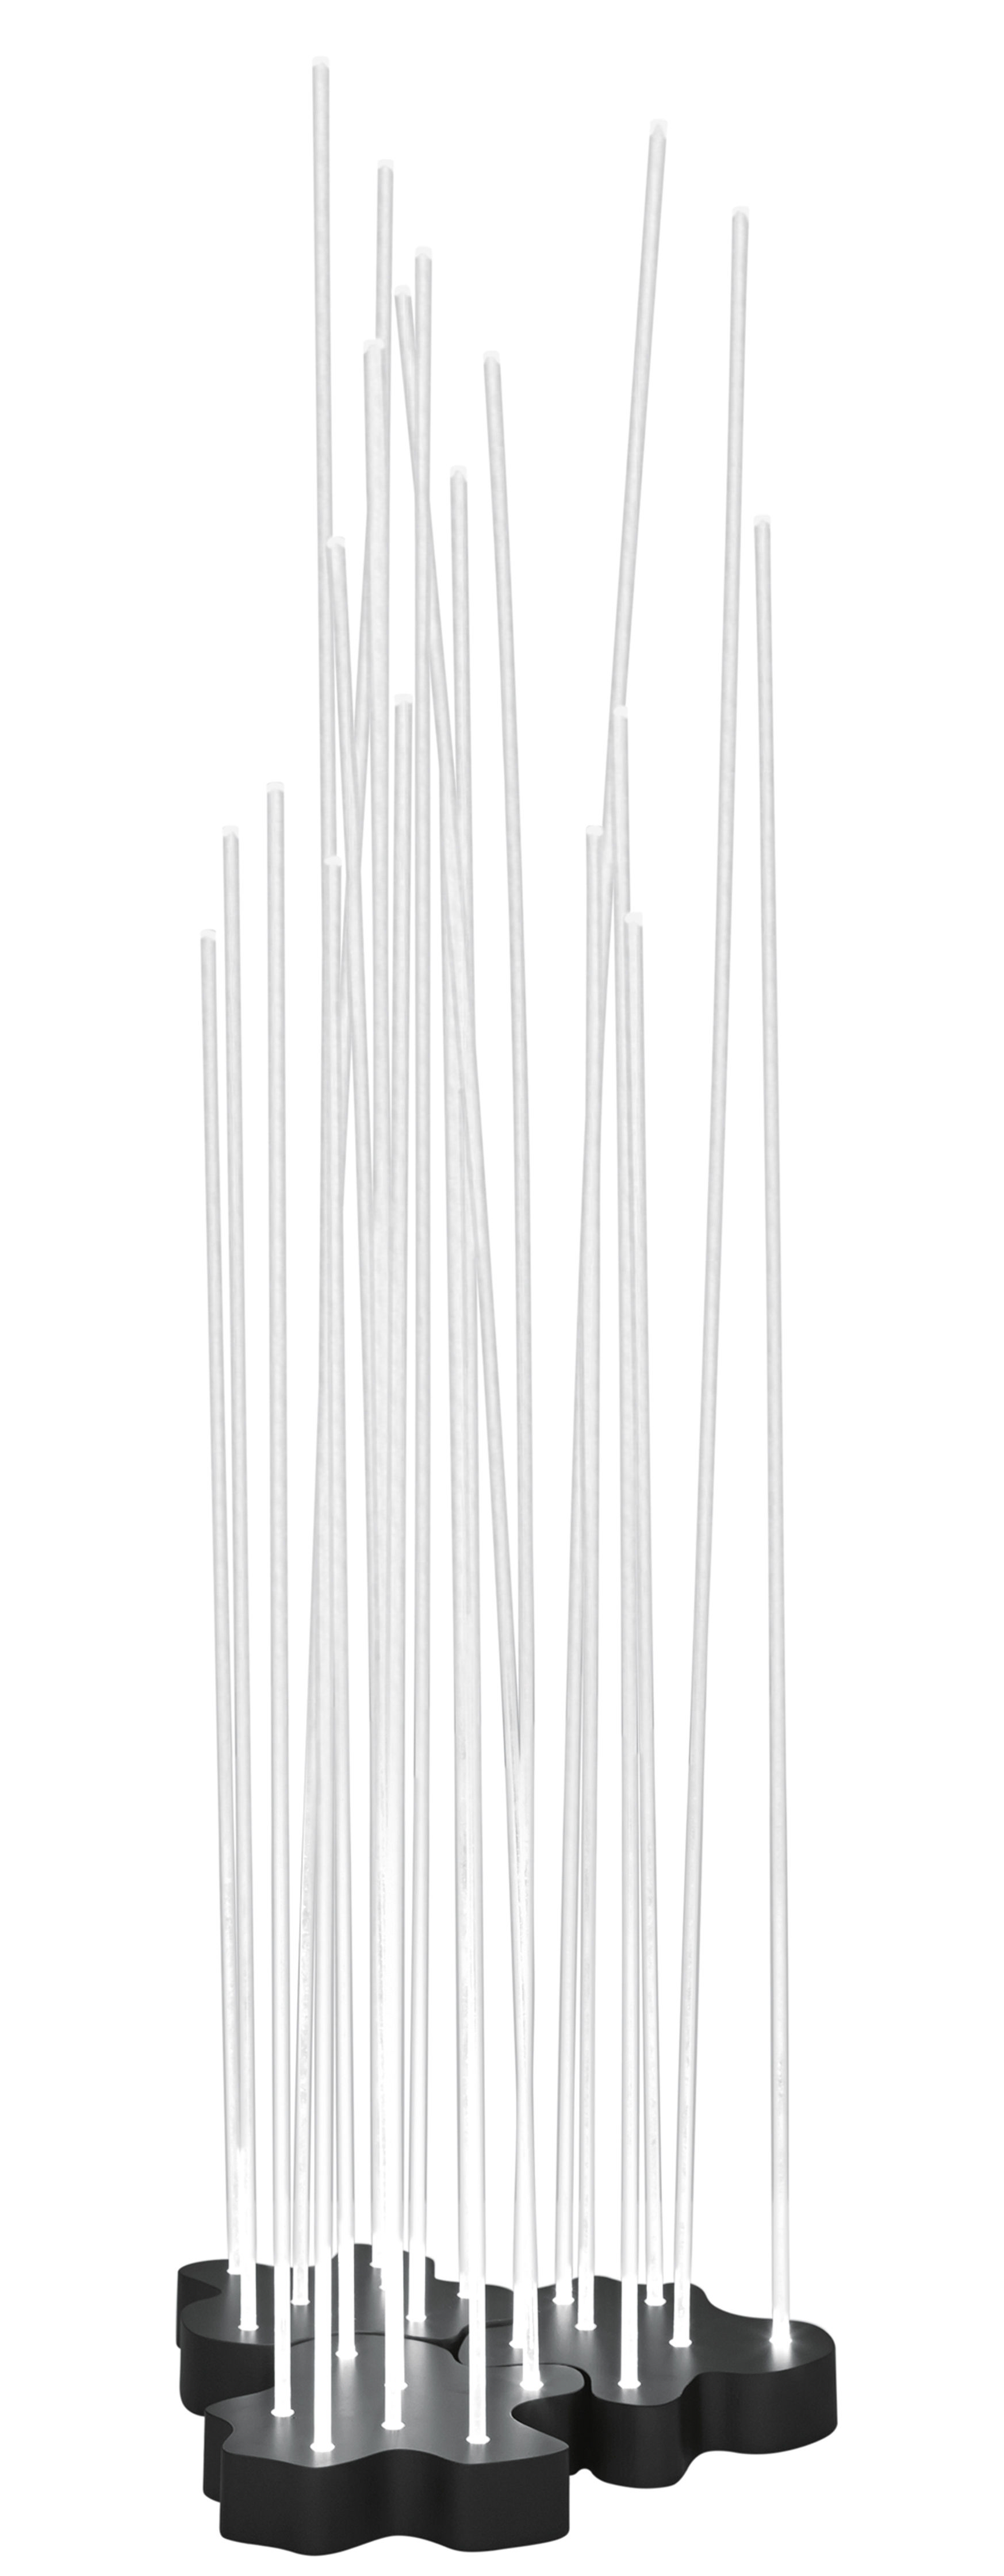 Luminaire - Lampadaires - Lampadaire Reeds LED Outdoor / 21 tiges - Artemide - Blanc / Base gris anthracite - Acier inoxydable peint, PMMA